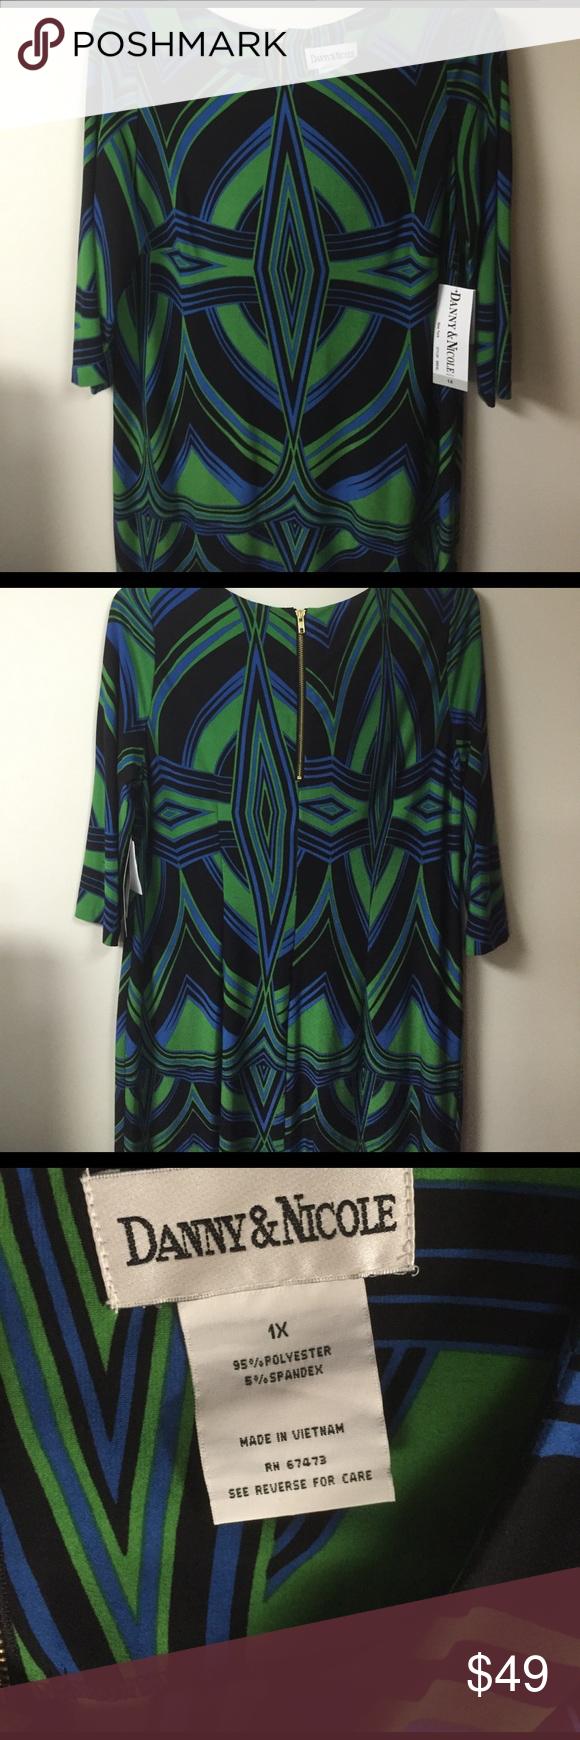 Dress Size 1X Danna & Niccole Dresses